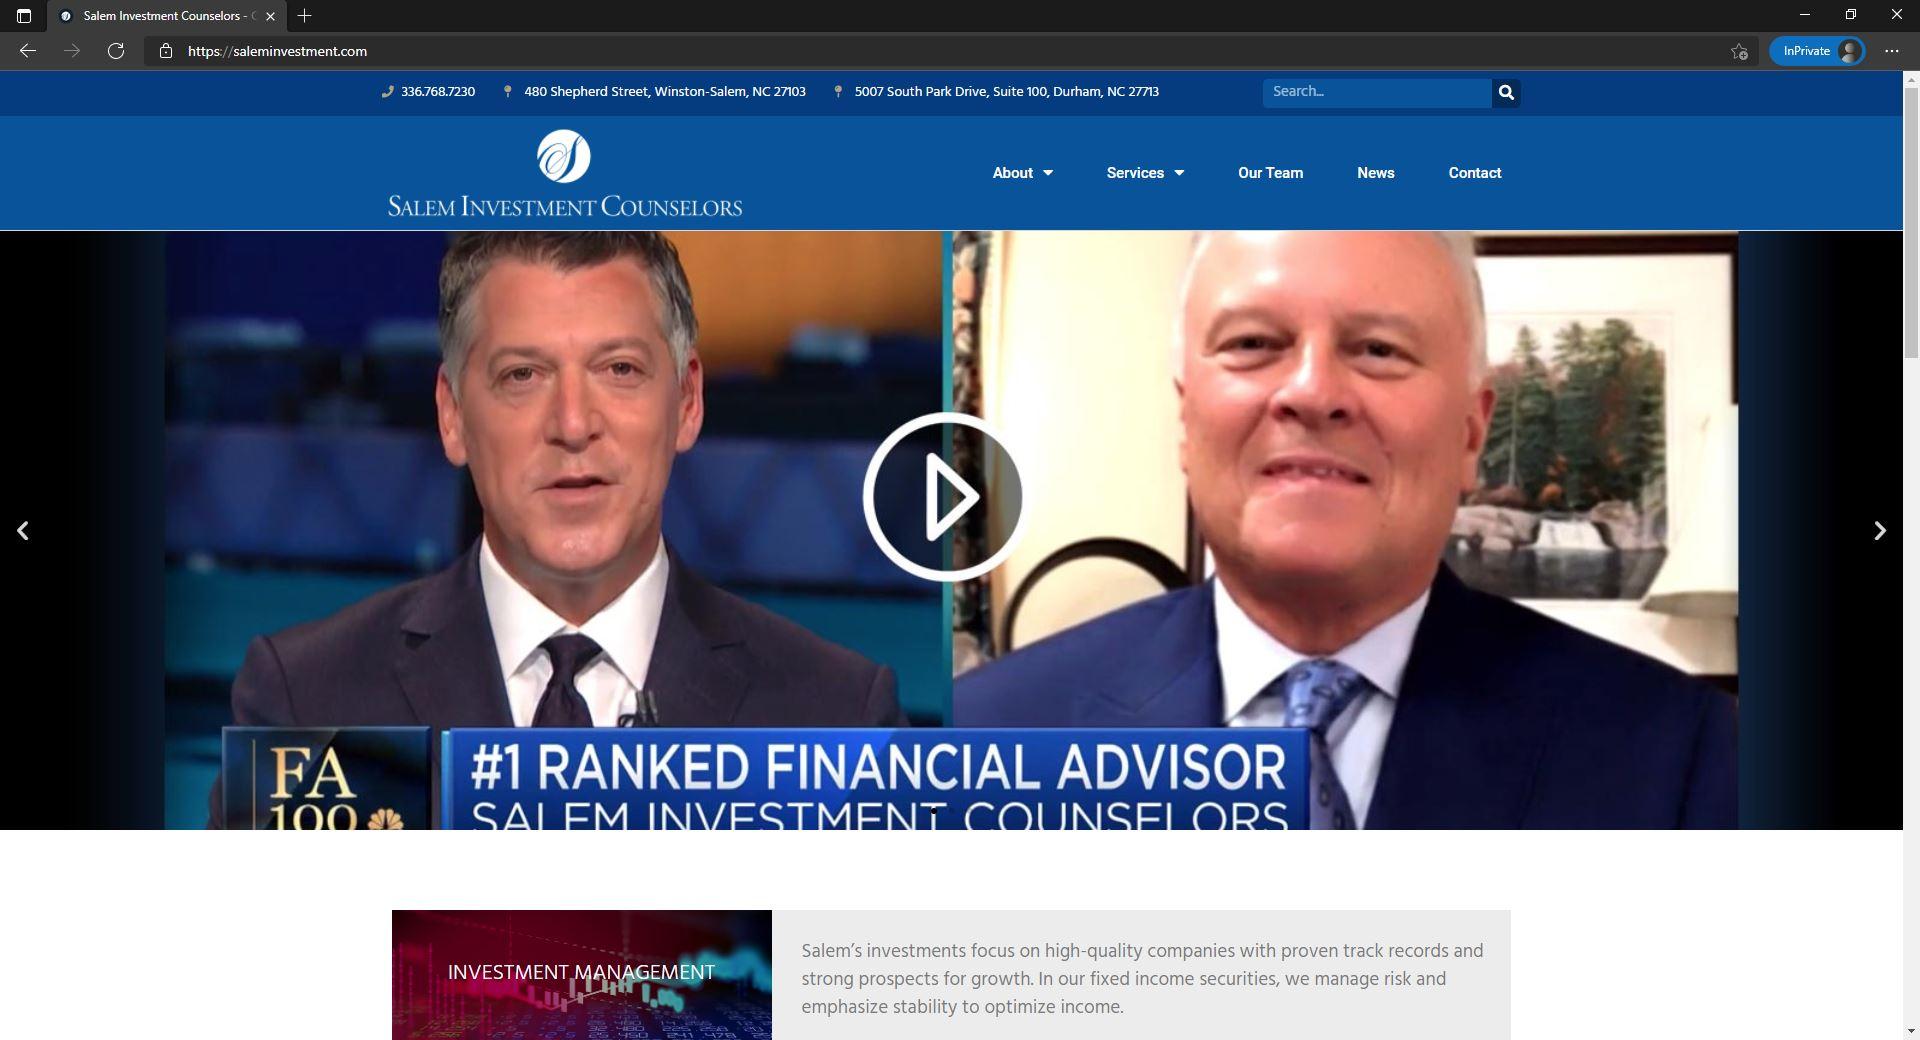 Salem Investment Counselors website